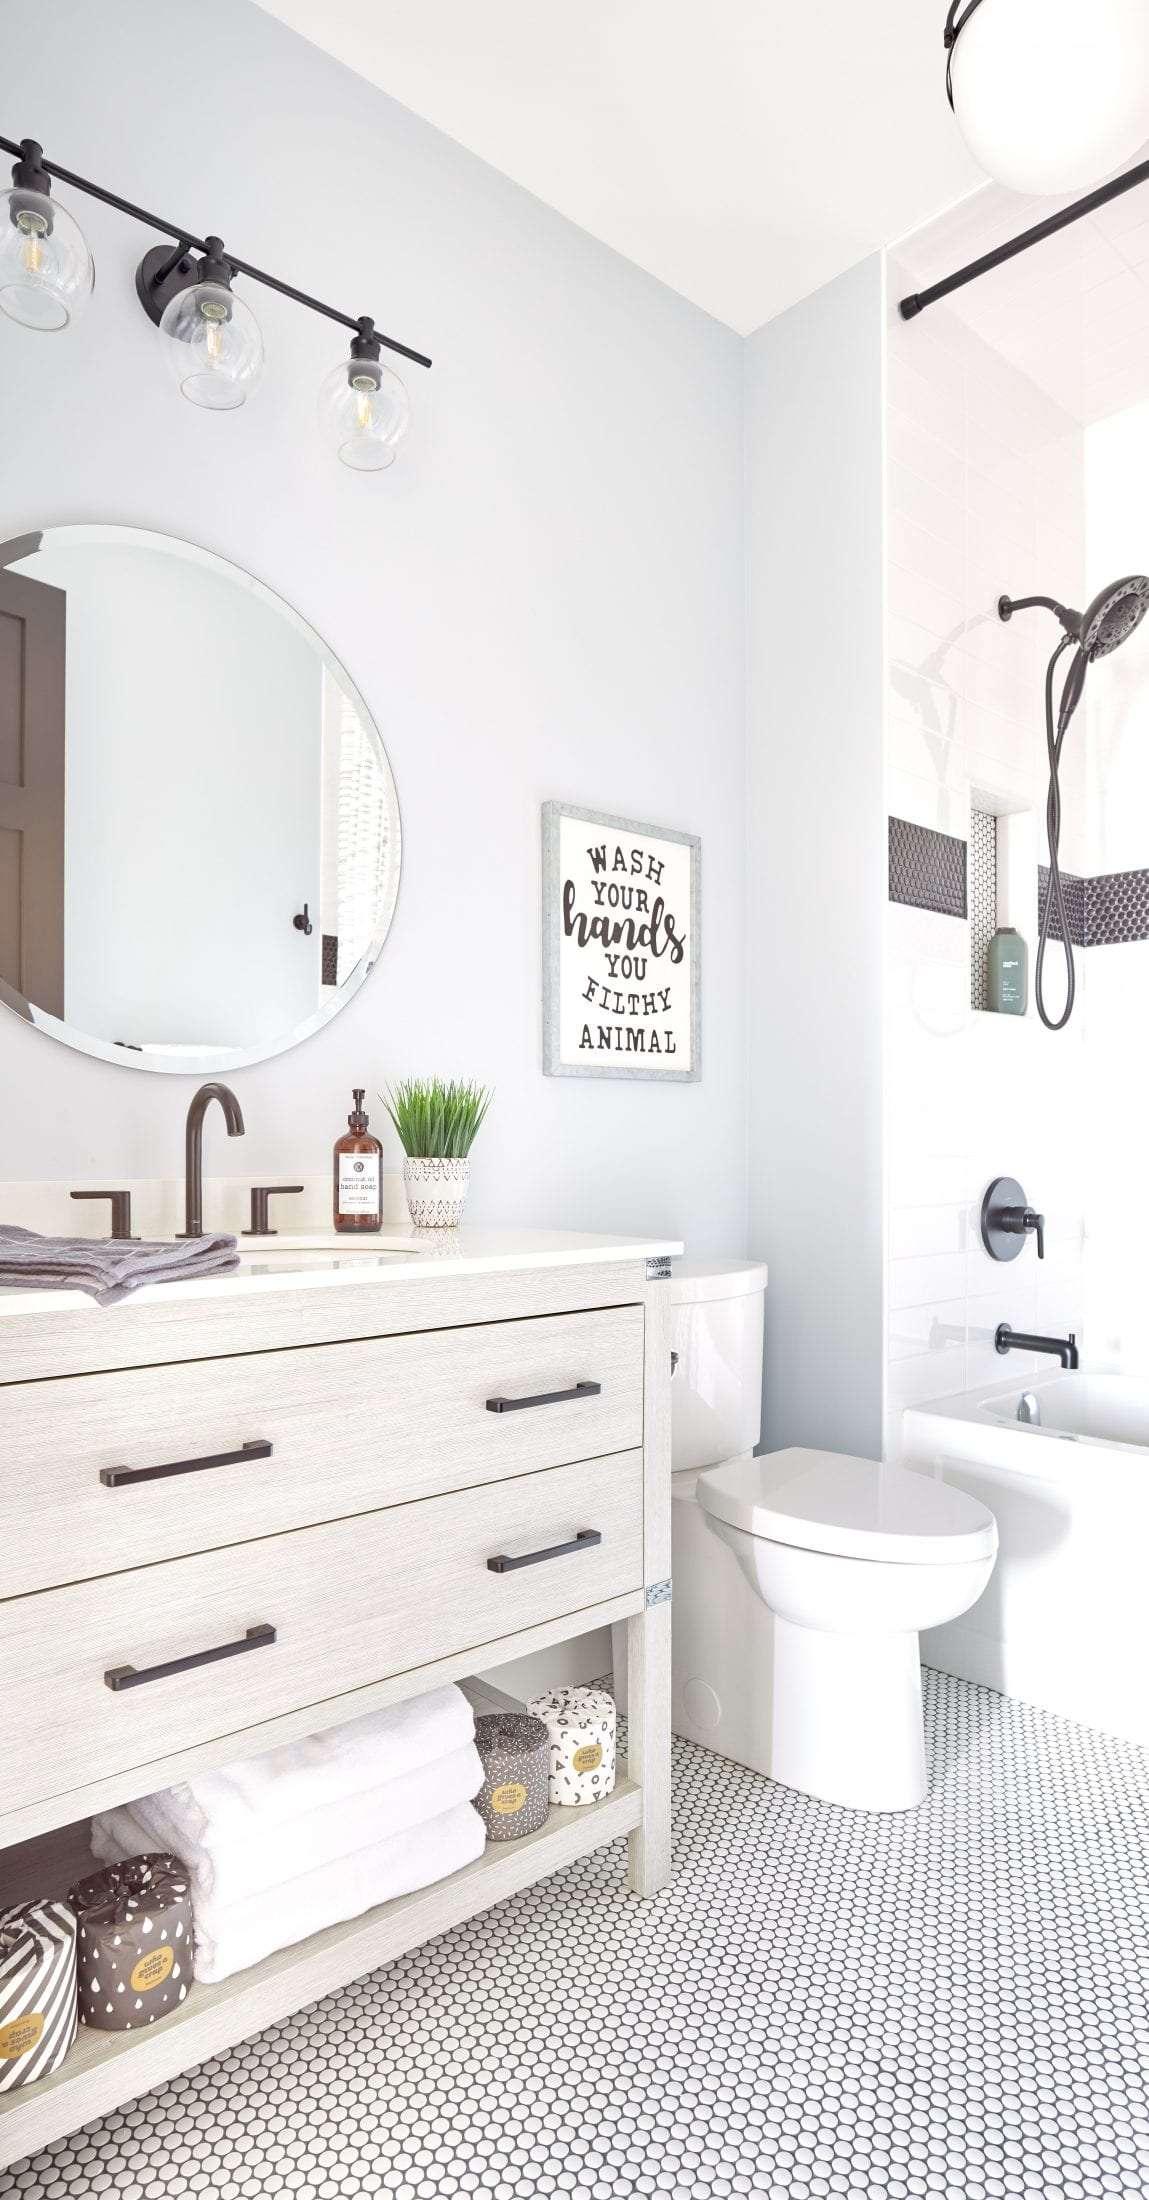 Guest bathroom design white penny tile black grout